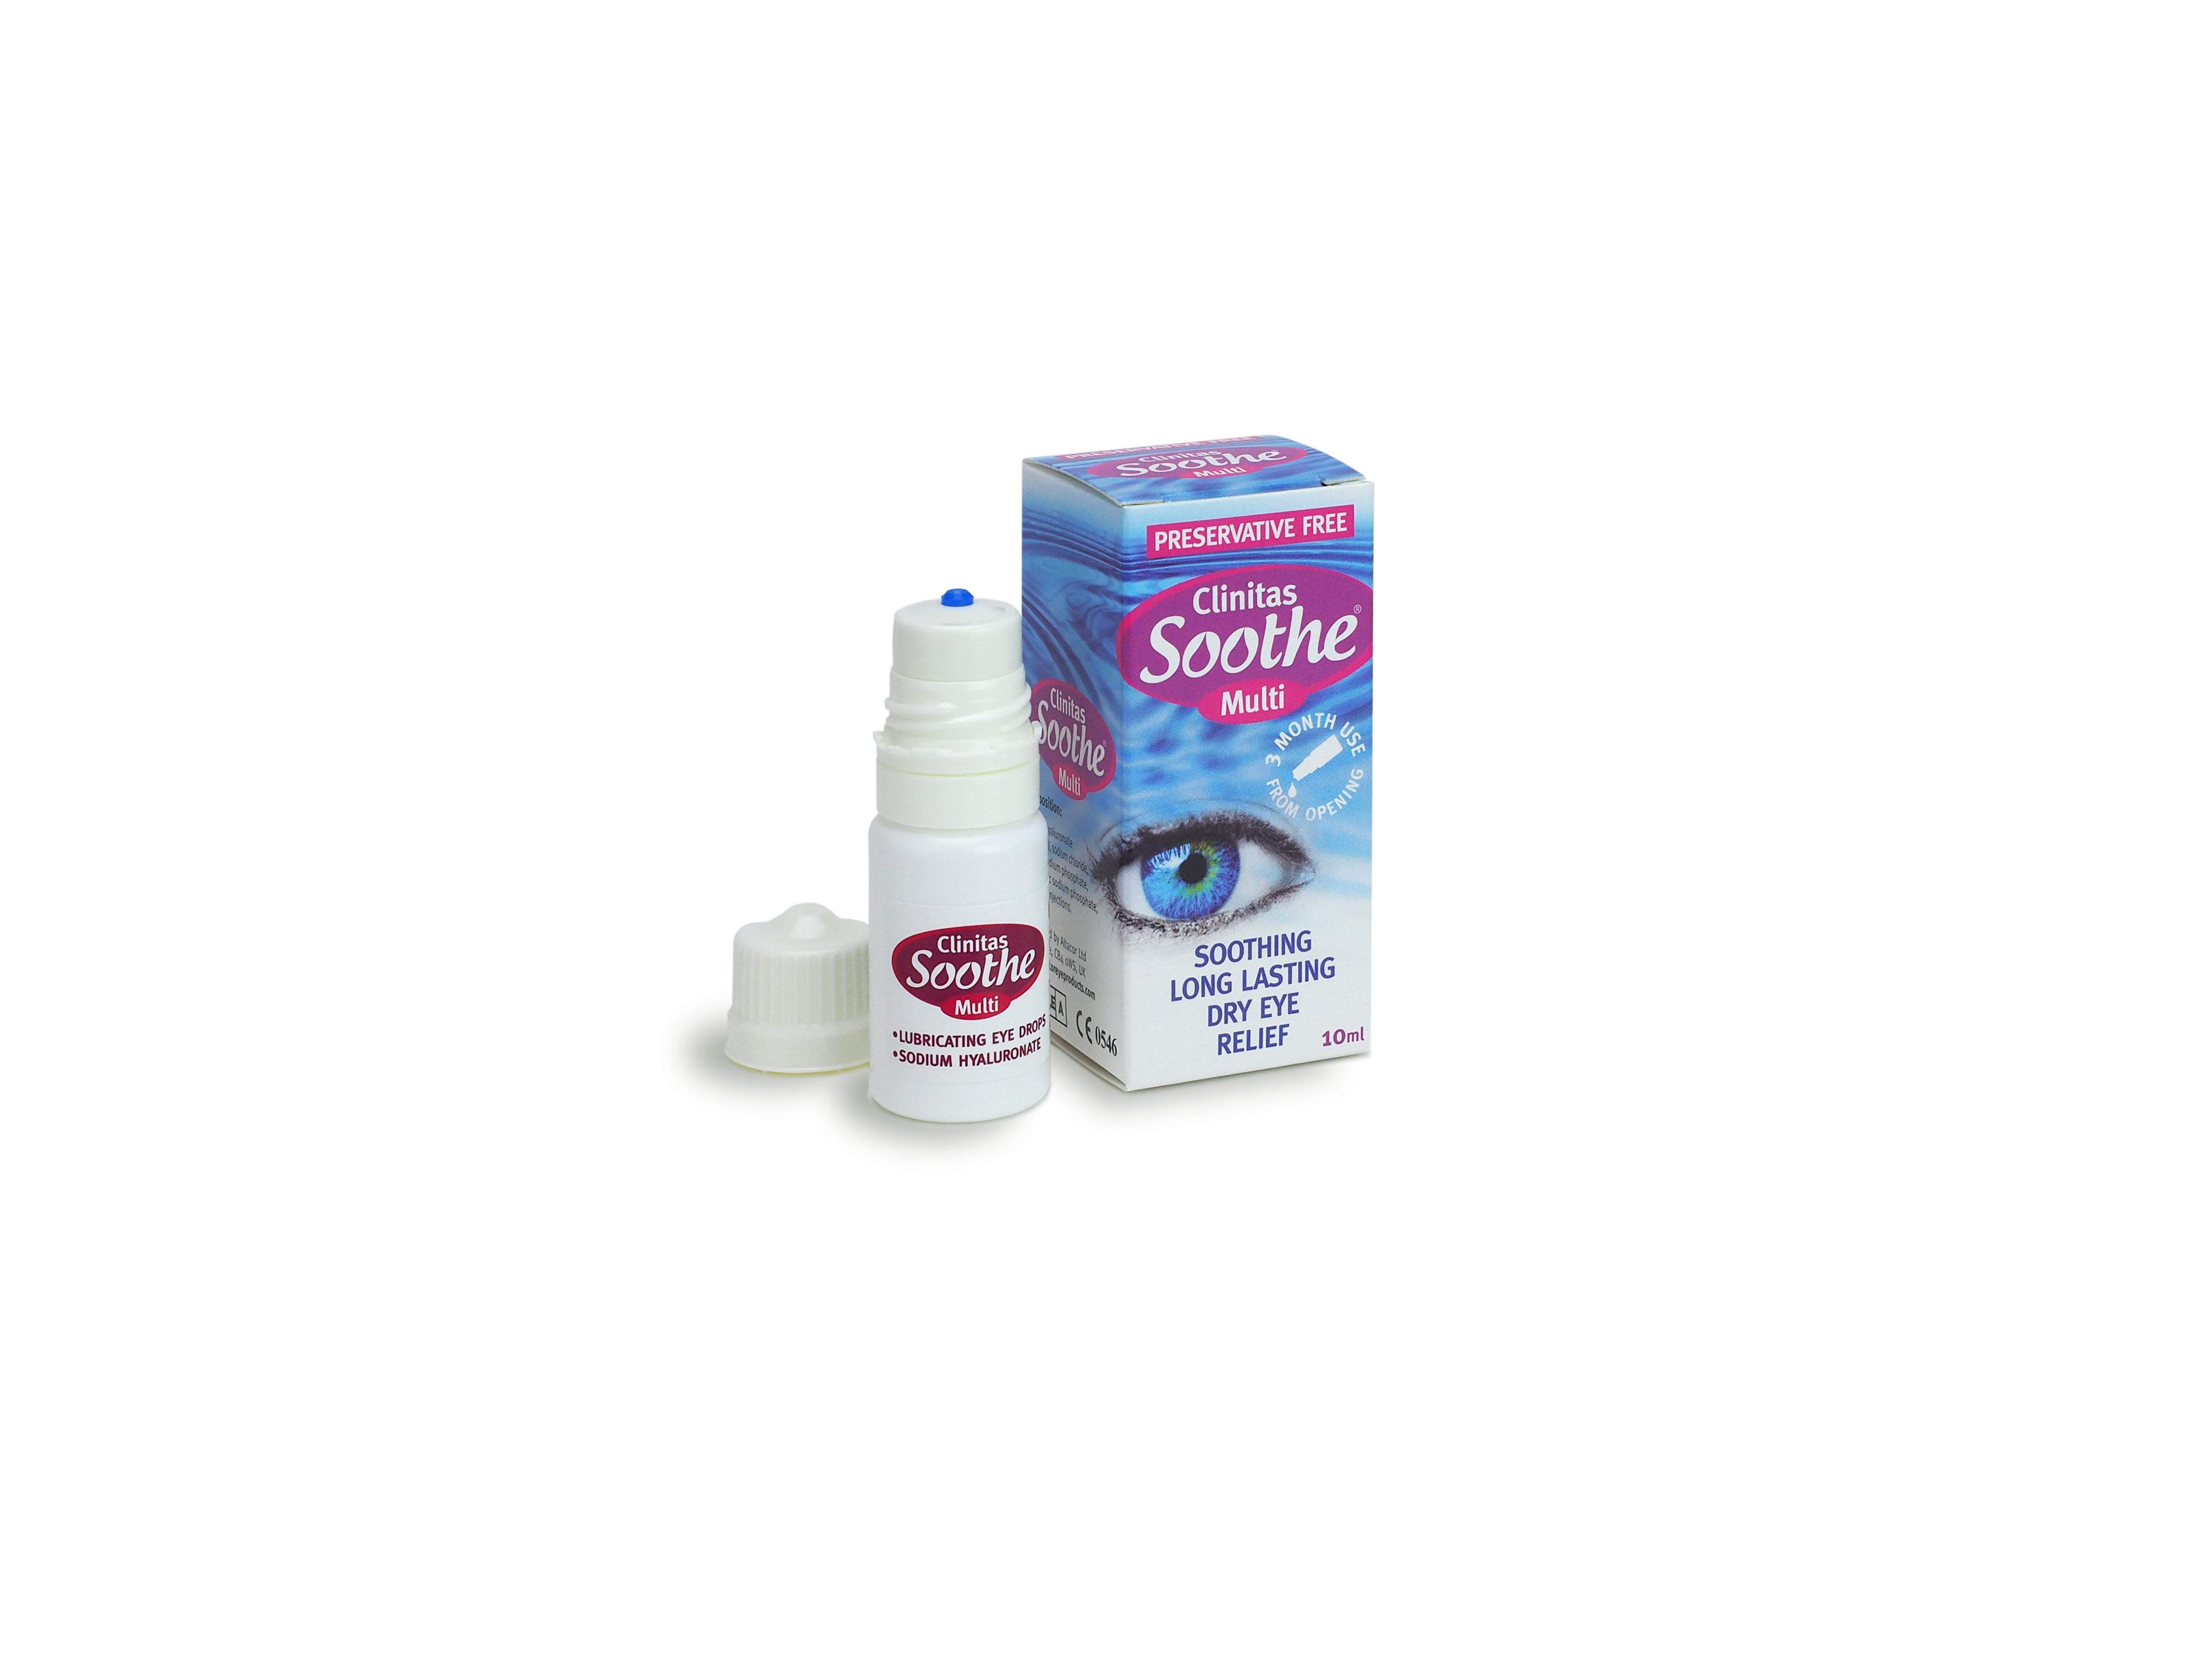 Clinitas Soothe Multi Lubricating Eye Drops 10ml